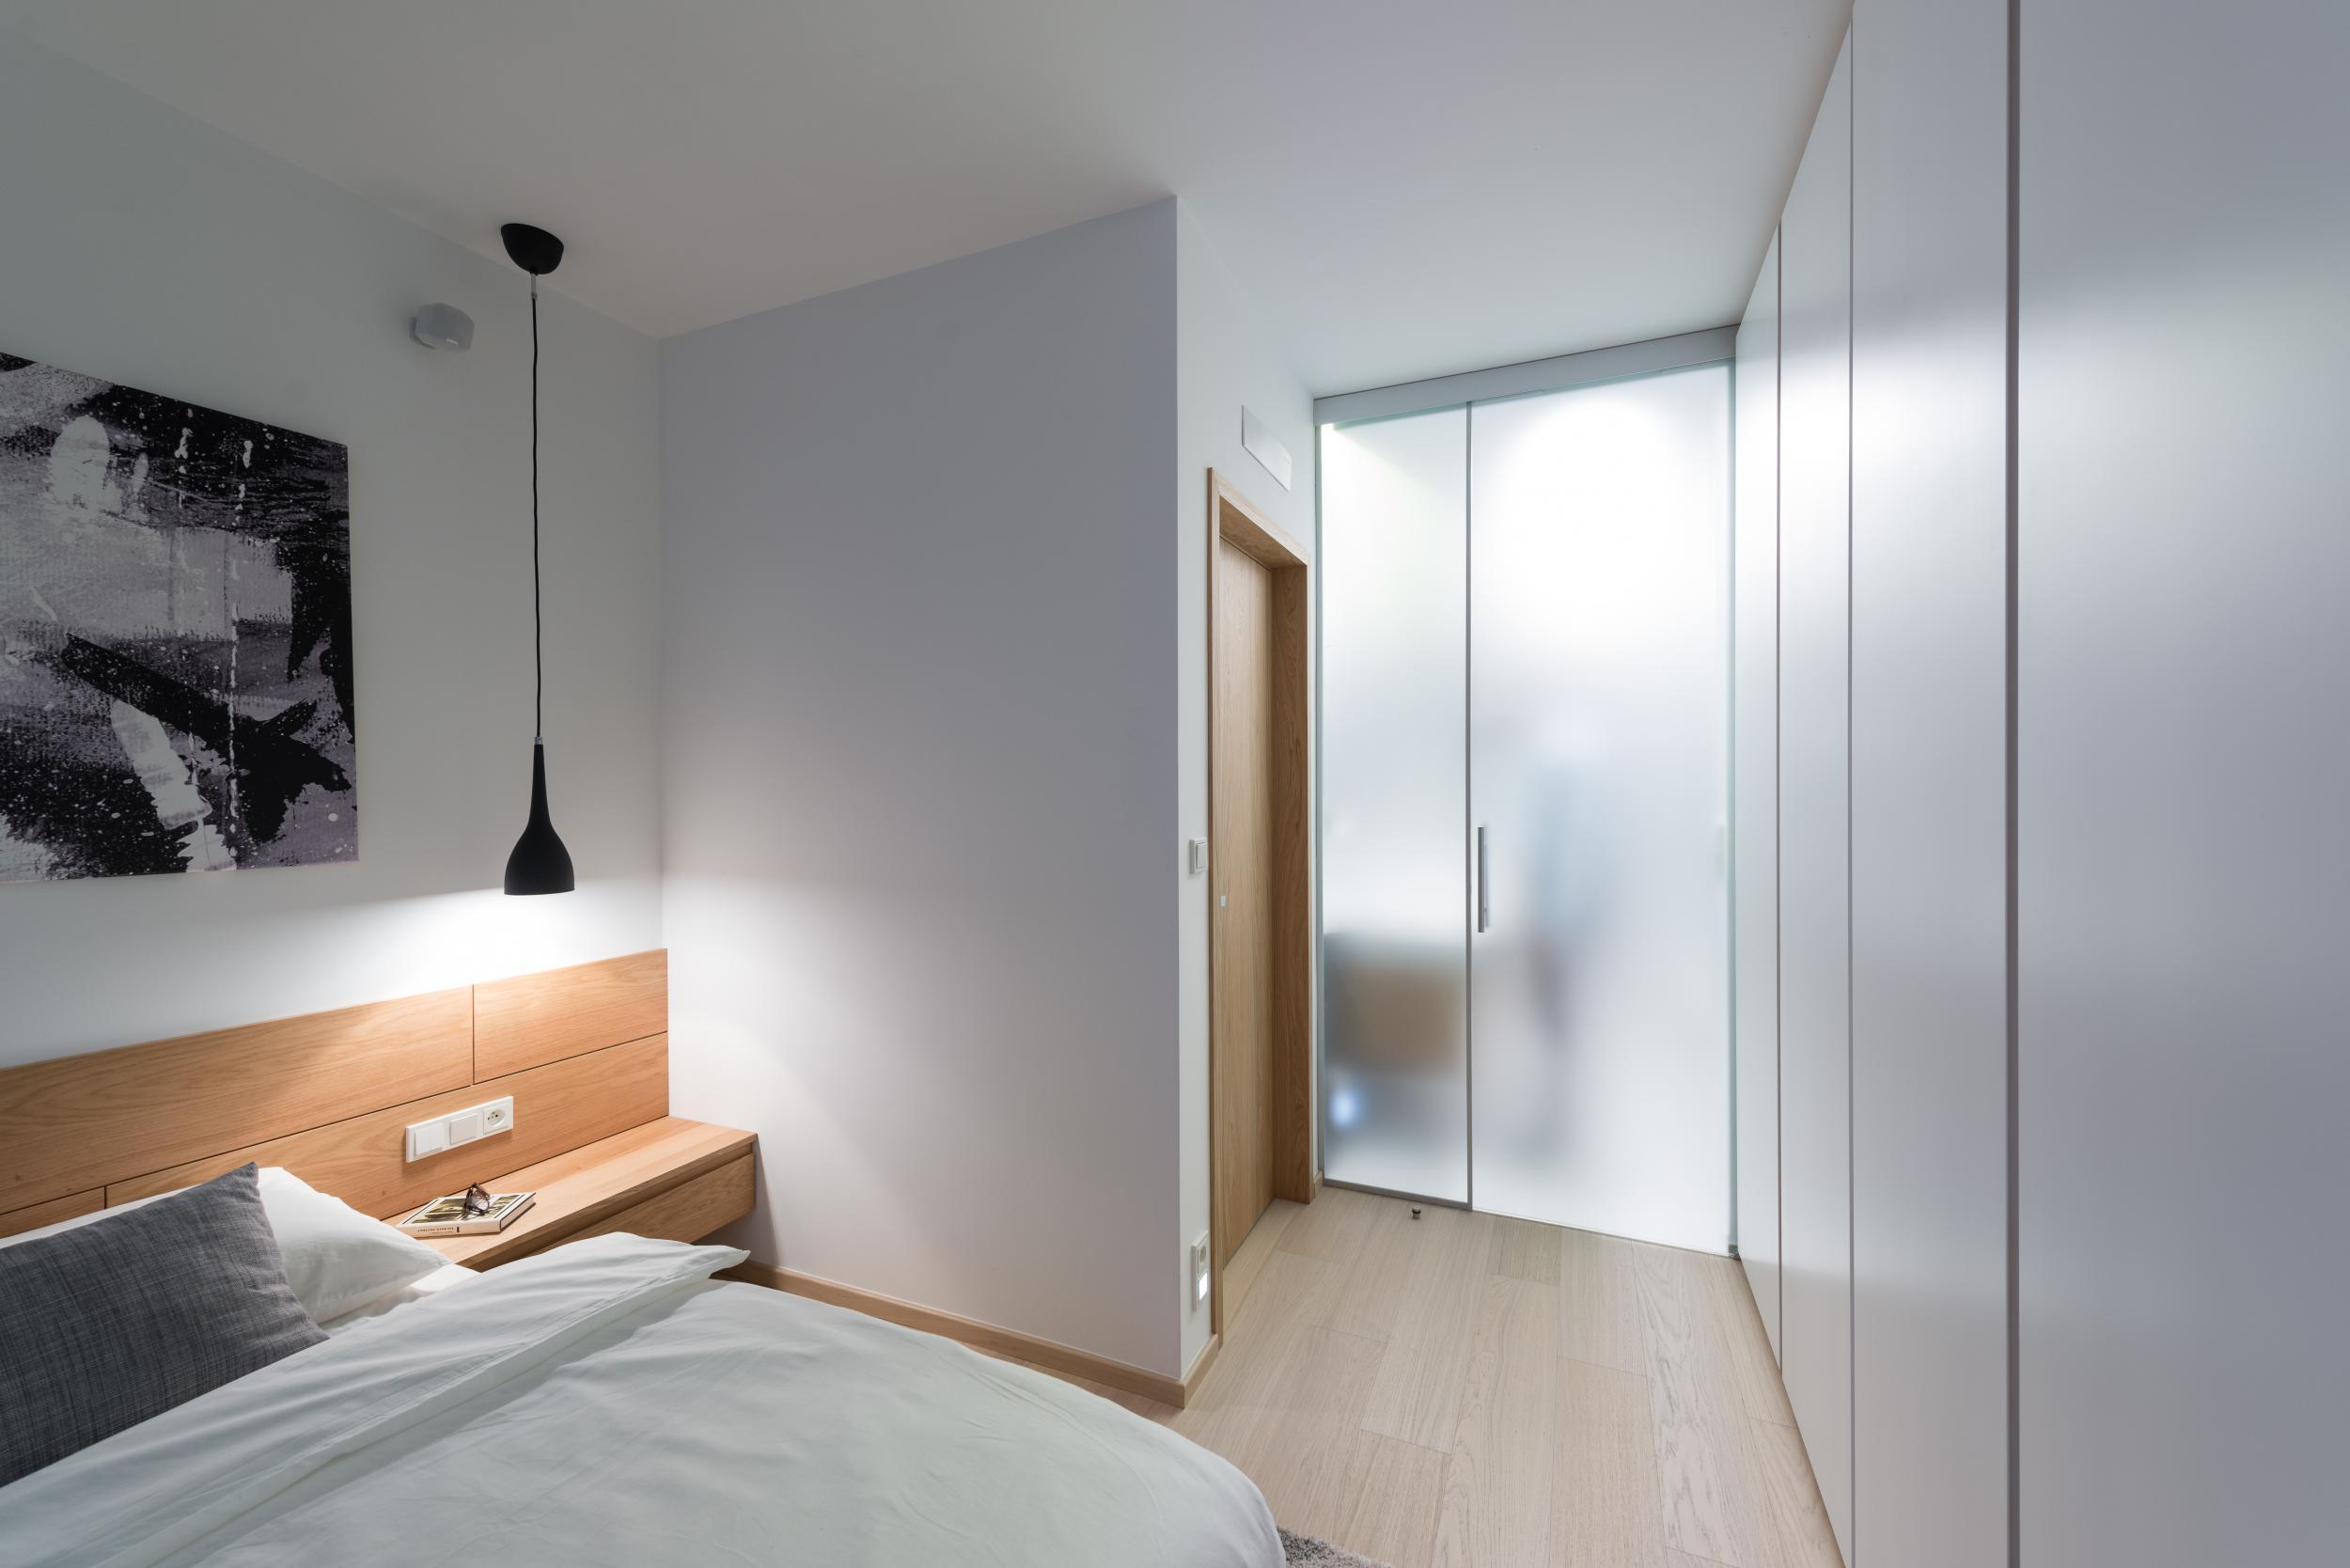 Interior design of a two bedroom apartment bratislava for Bathroom interior design rules